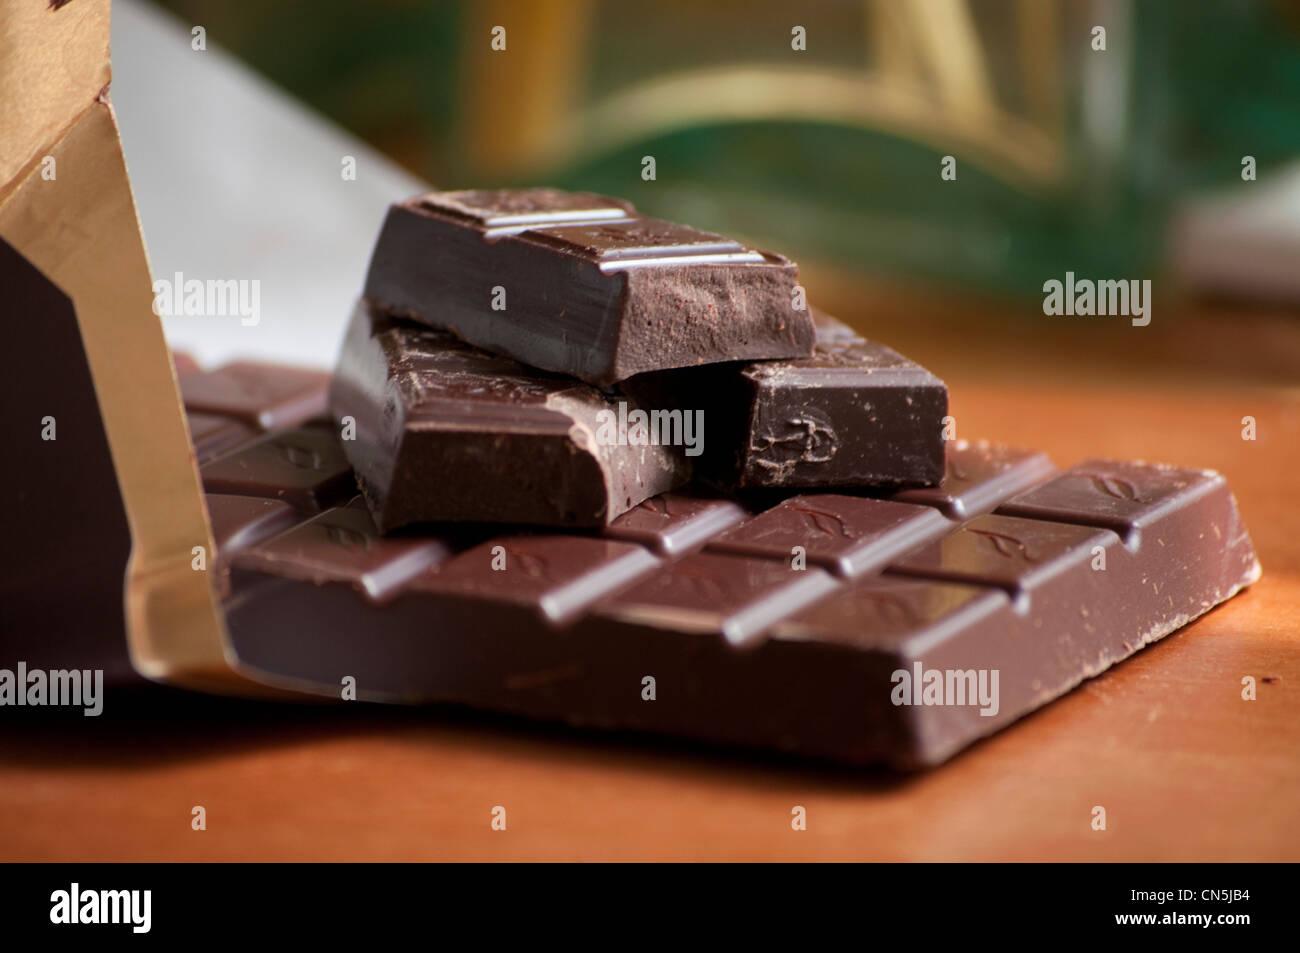 Barra de chocolate oscuro en la envoltura. Imagen De Stock